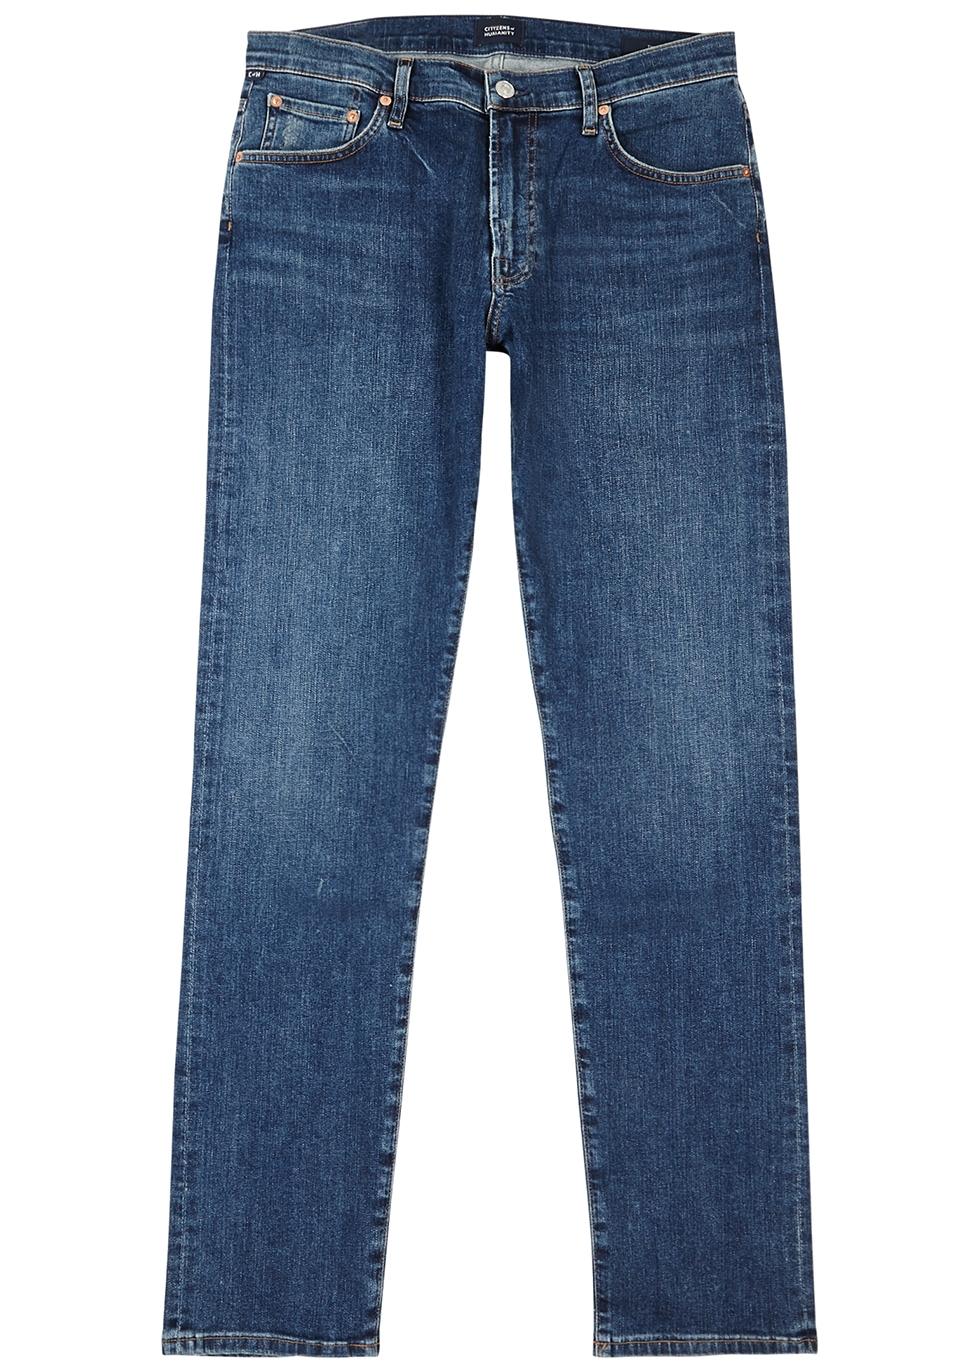 Joaquin blue slim-leg jeans